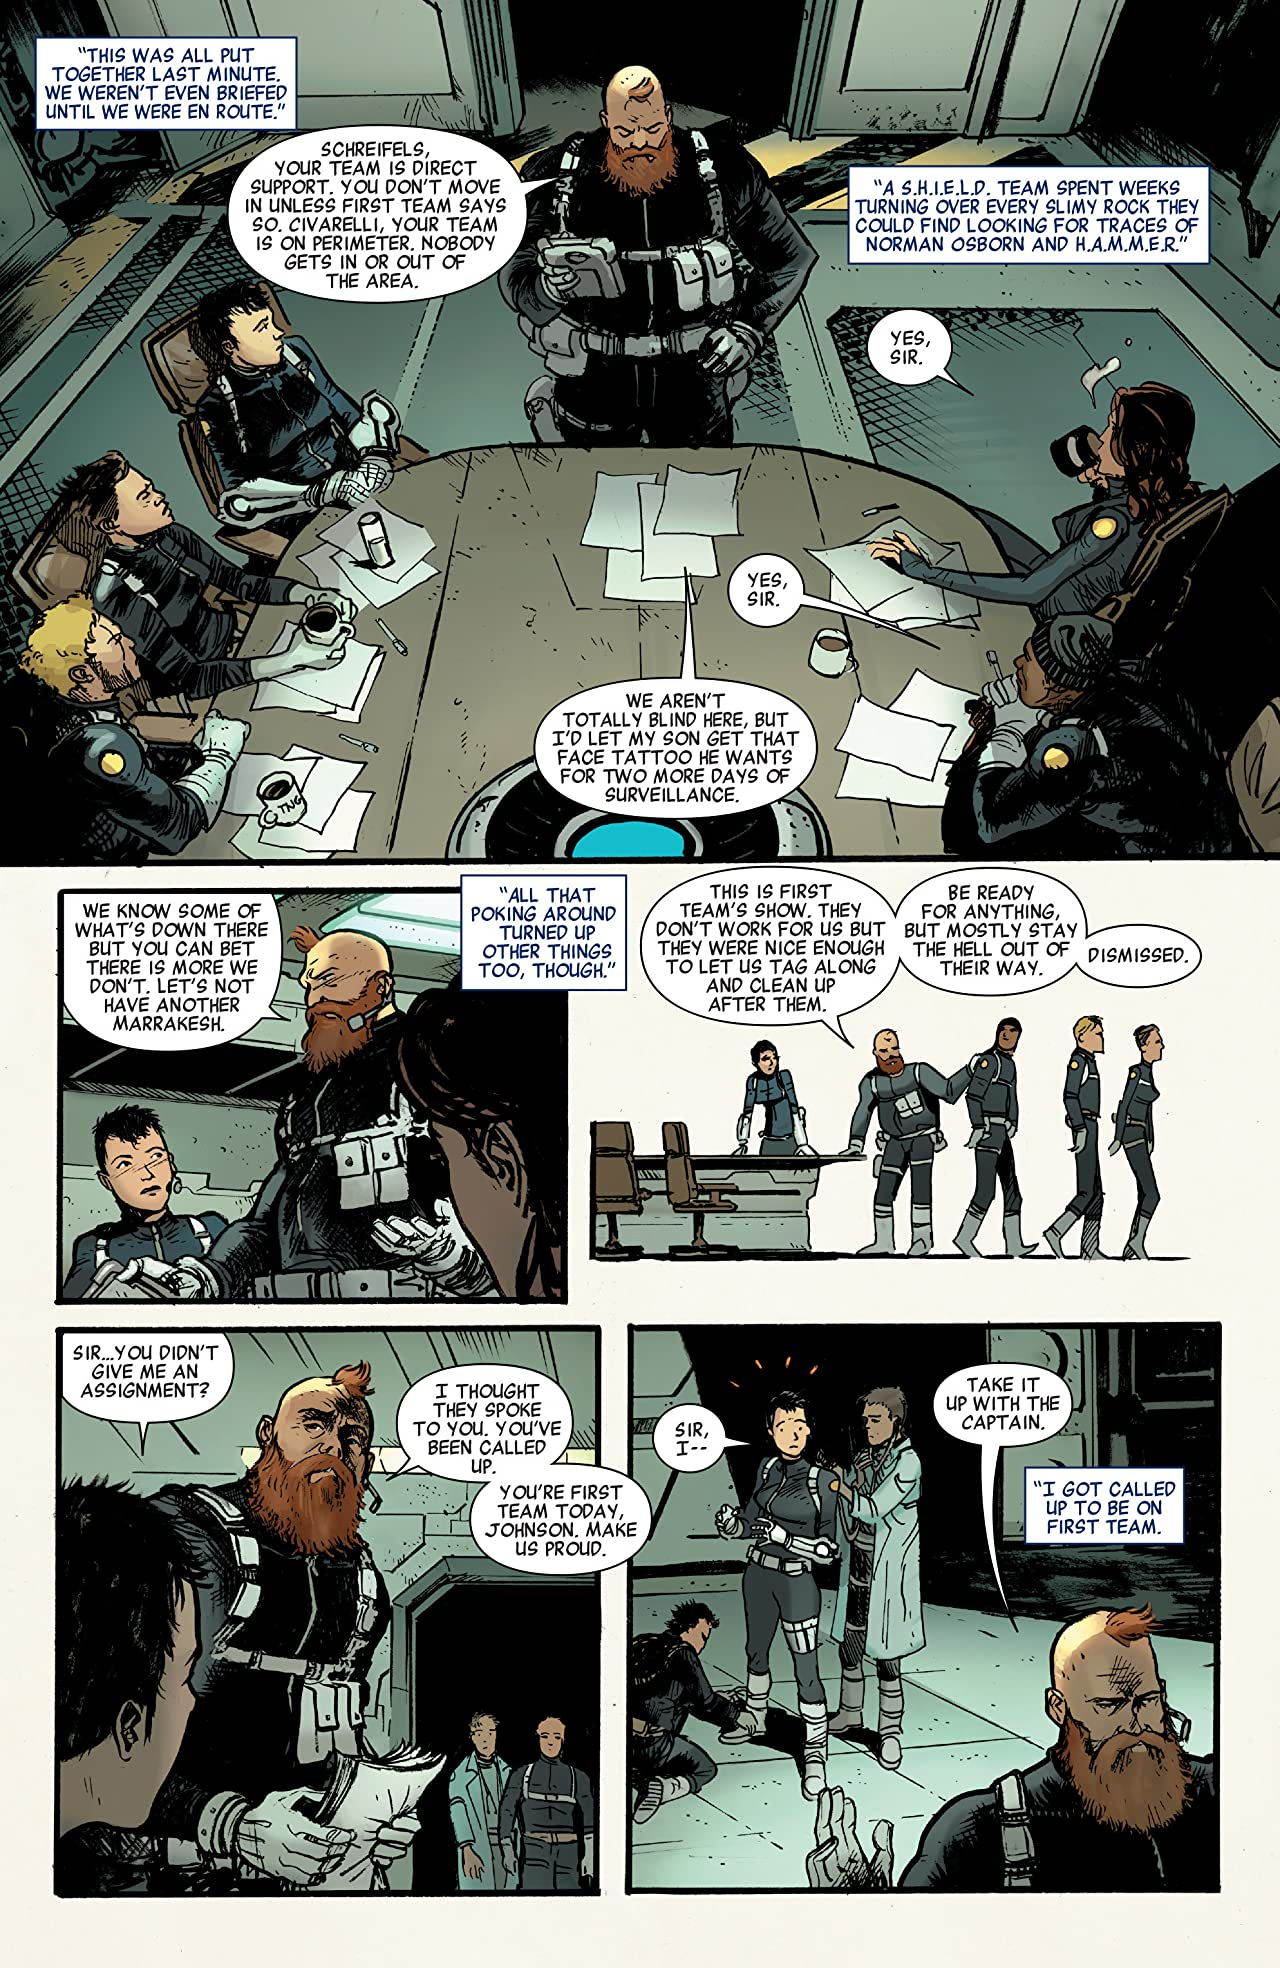 Quake: S.H.I.E.L.D. 50th Anniversary #1